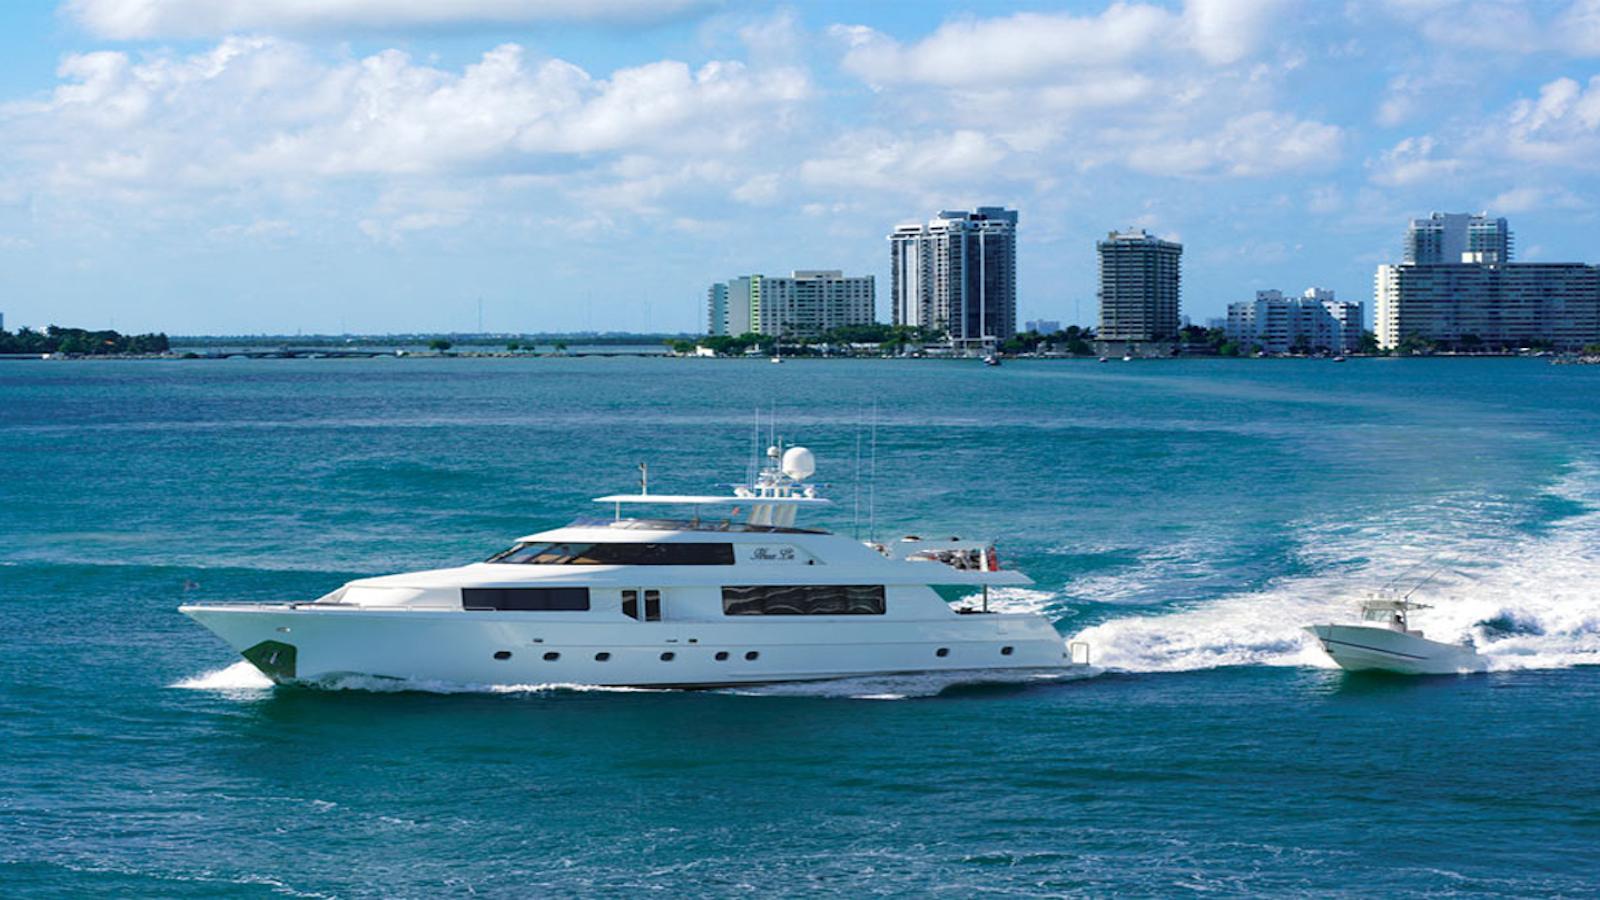 Frisky Lady Luxury Yacht for Charter